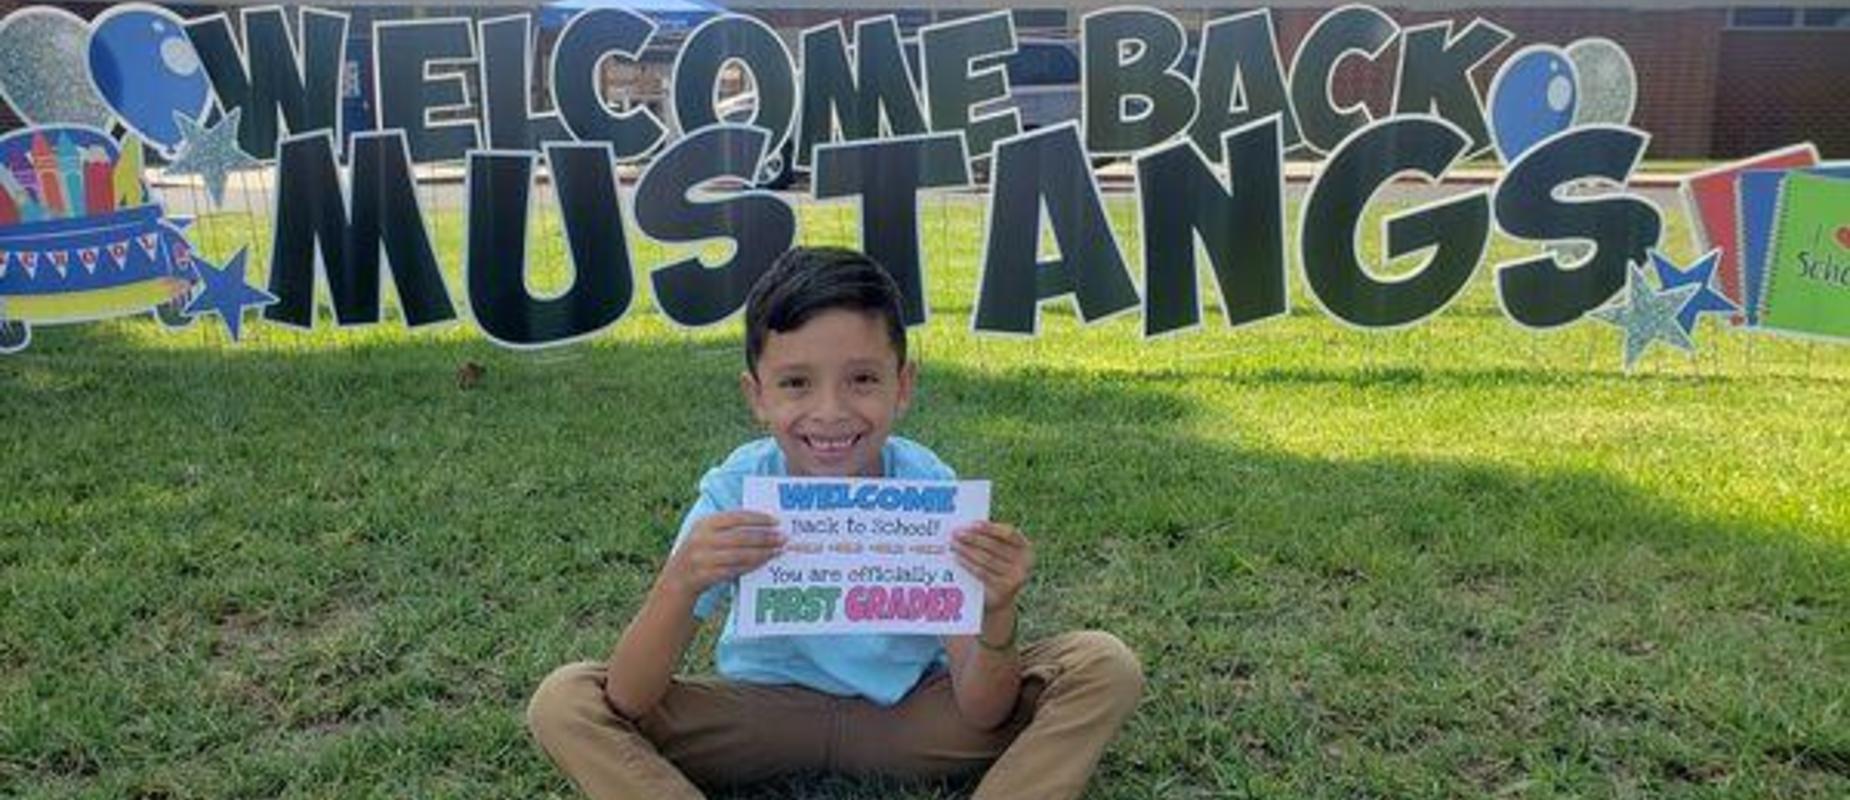 Boy with school sign